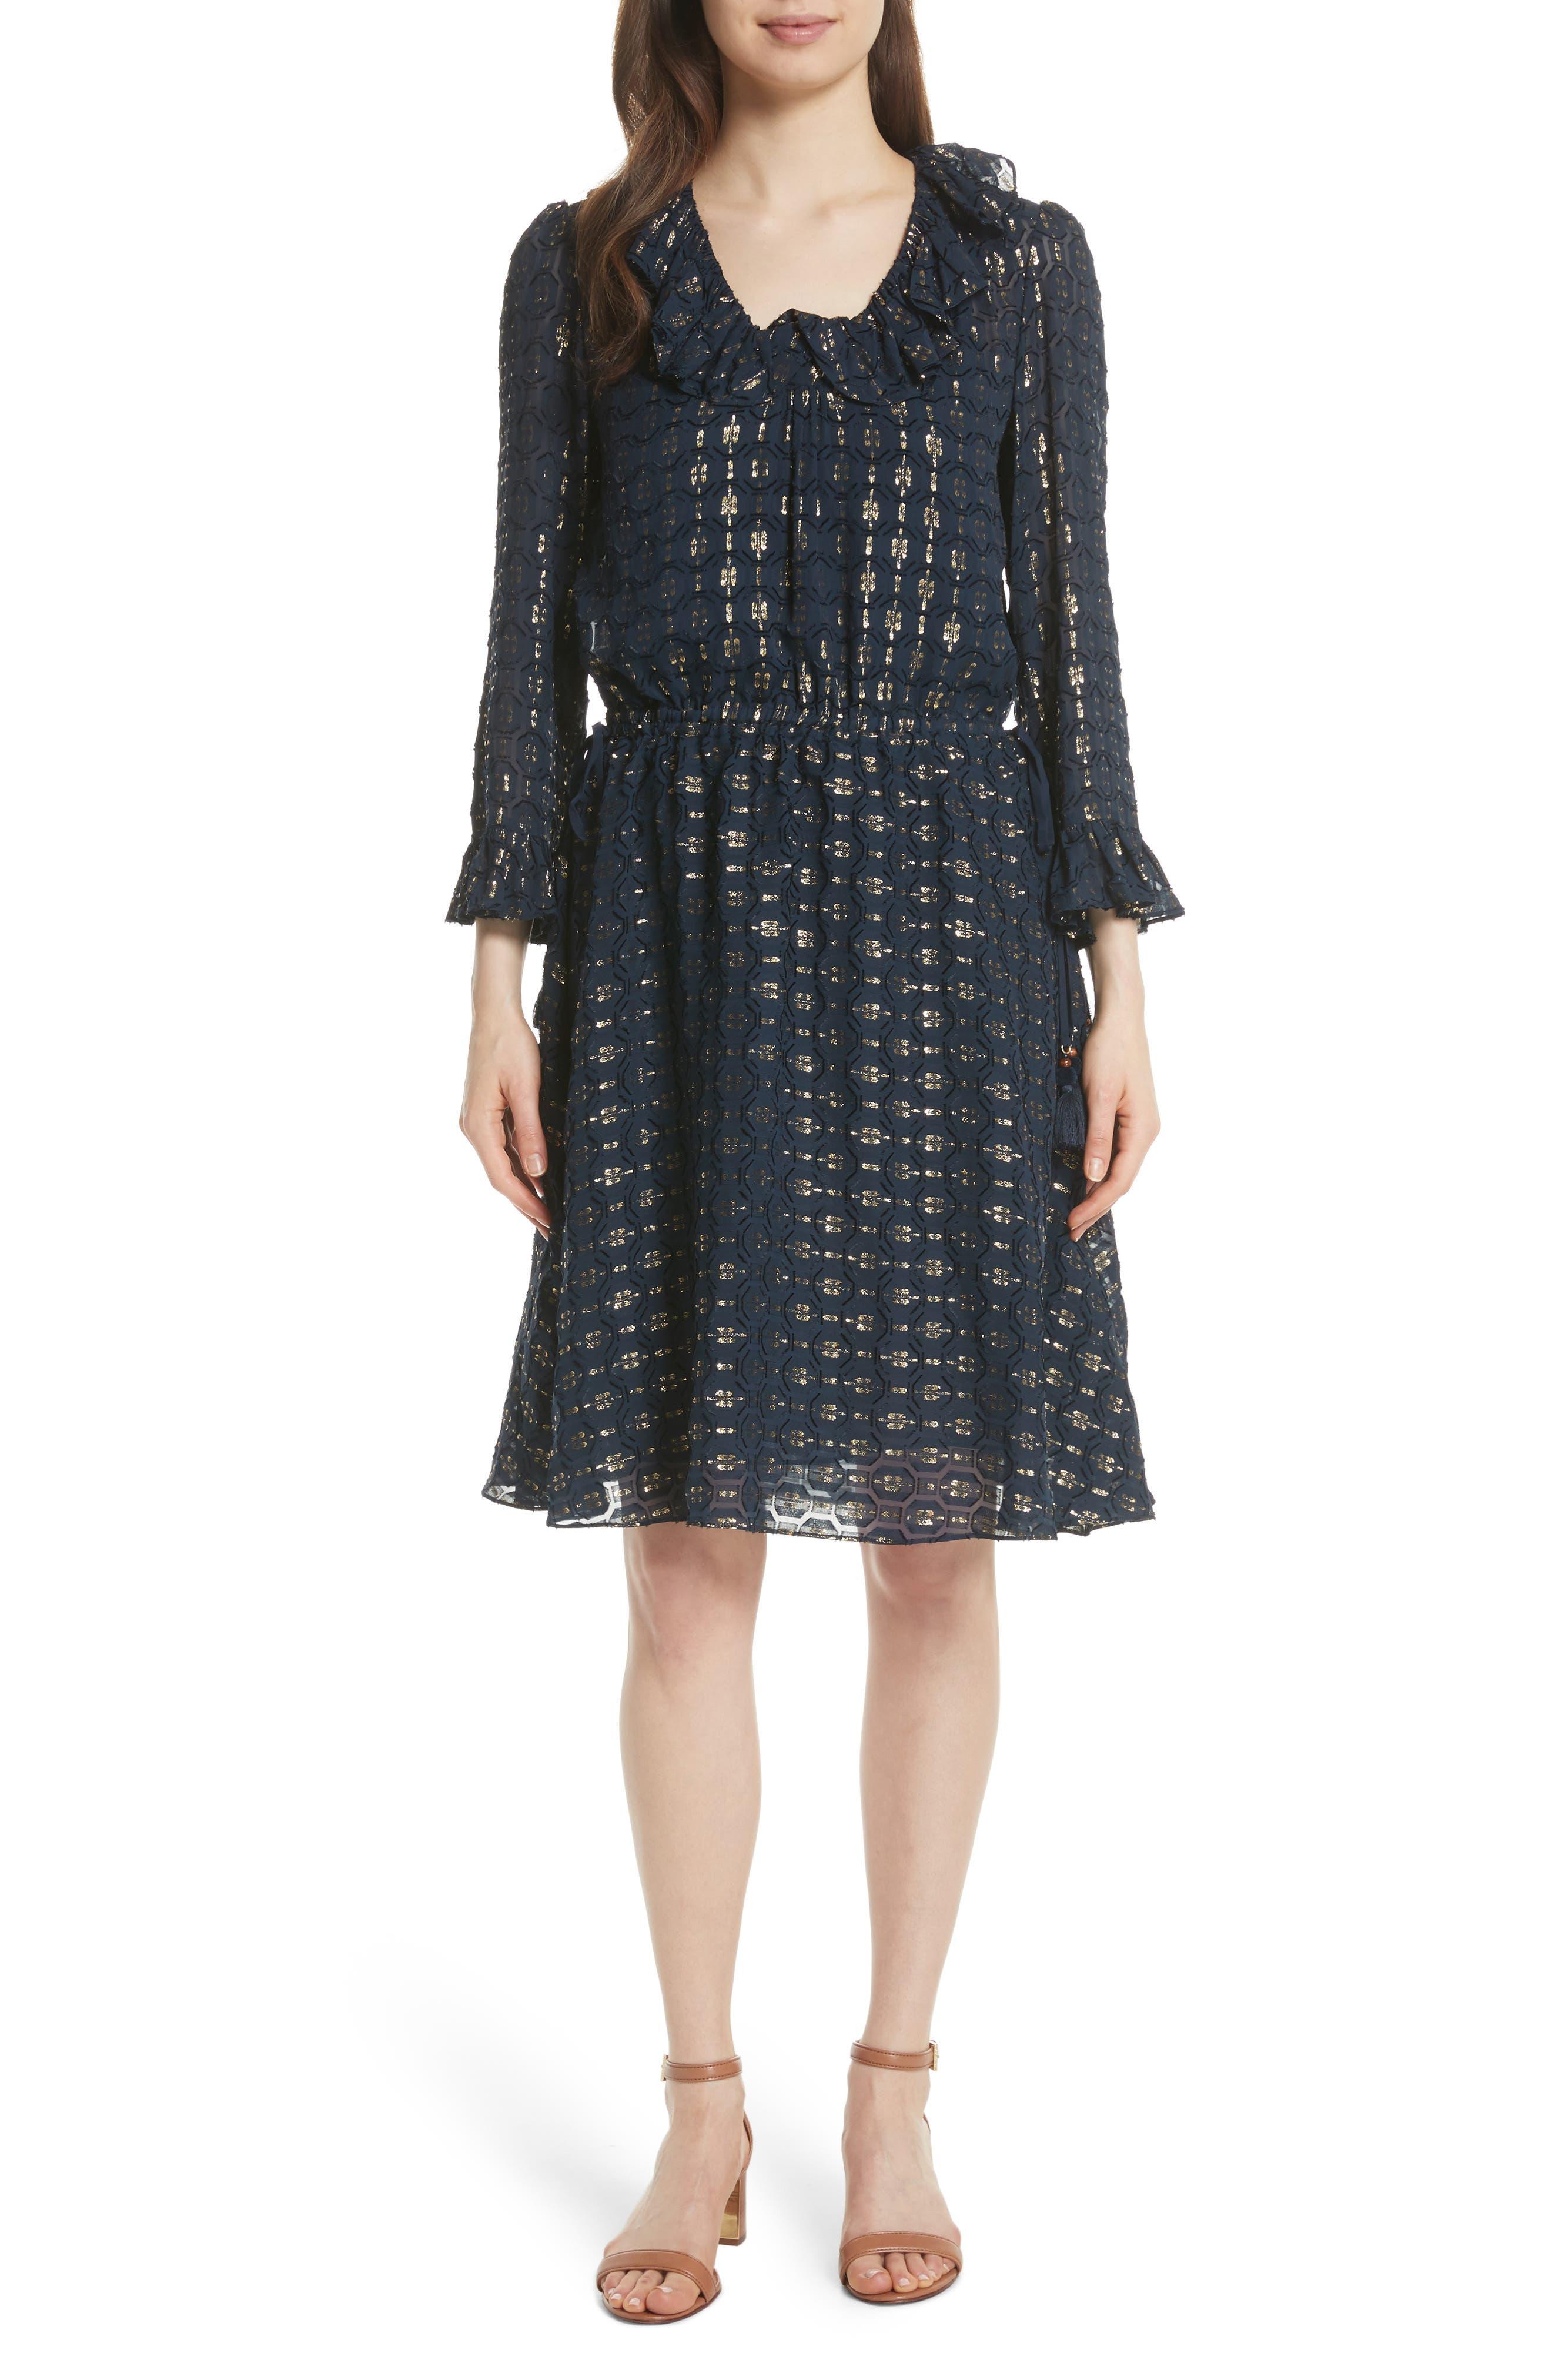 TORY BURCH Jasmine Silk Blend Dress, Main, color, 405